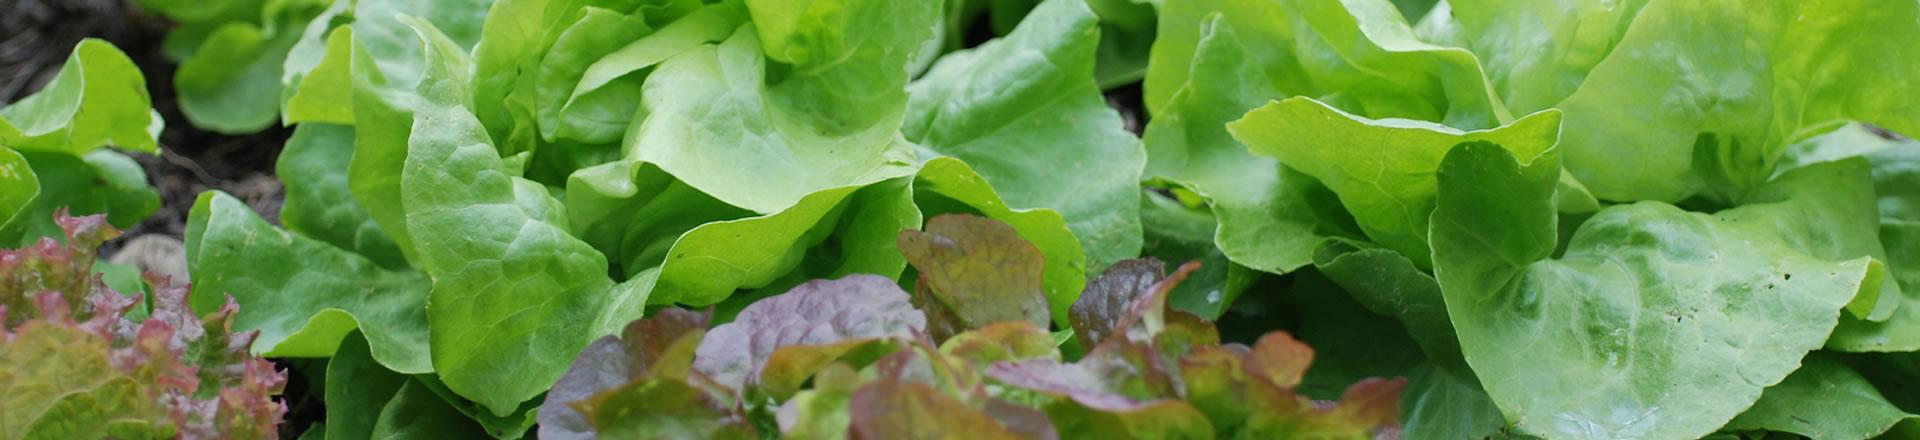 Buehne_Salat